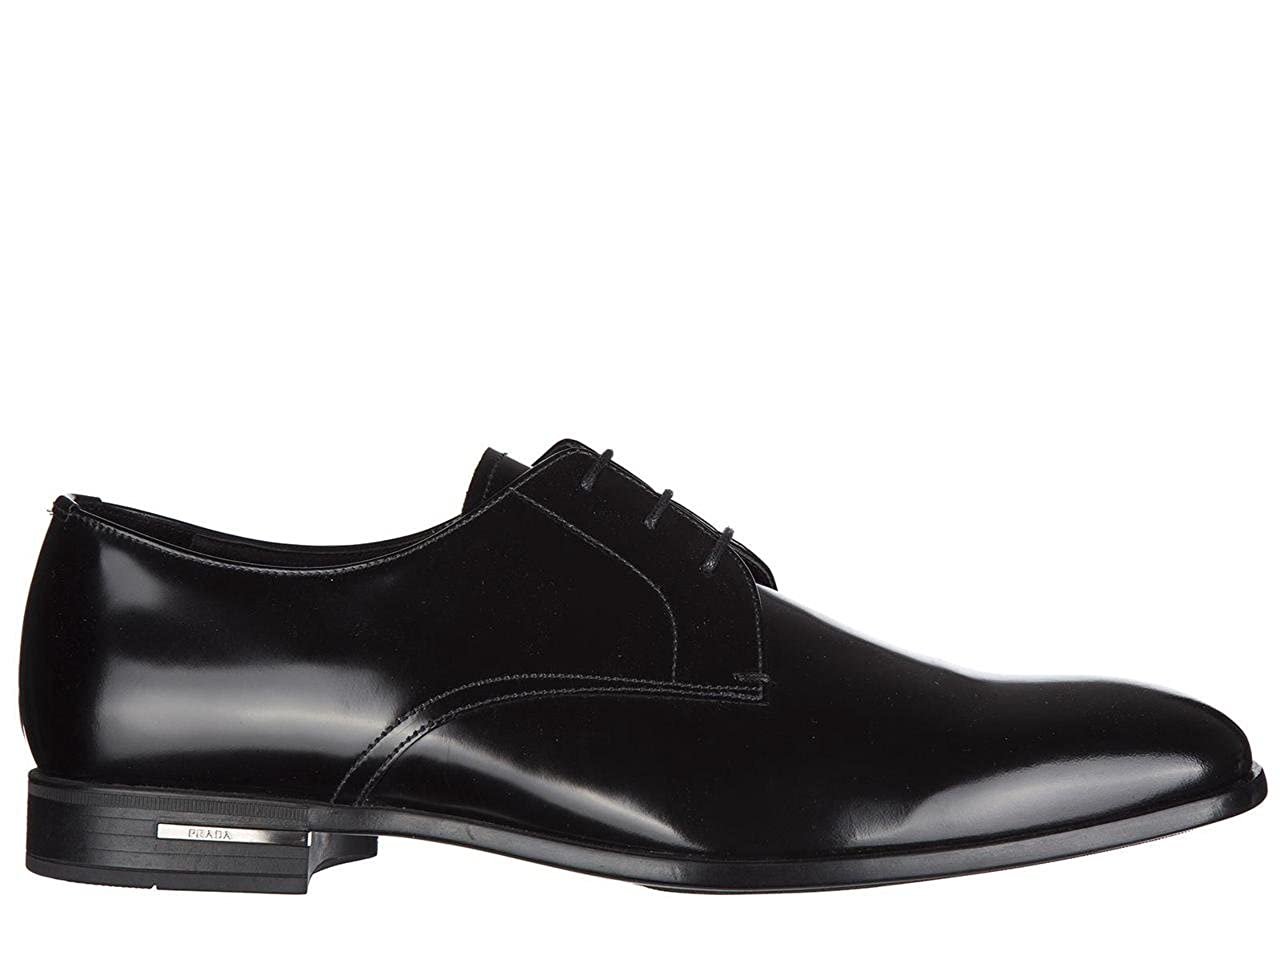 fb8d34afa506 Prada Men's Calzature Uomo Spazzolato Fume (10): Amazon.ca: Shoes & Handbags